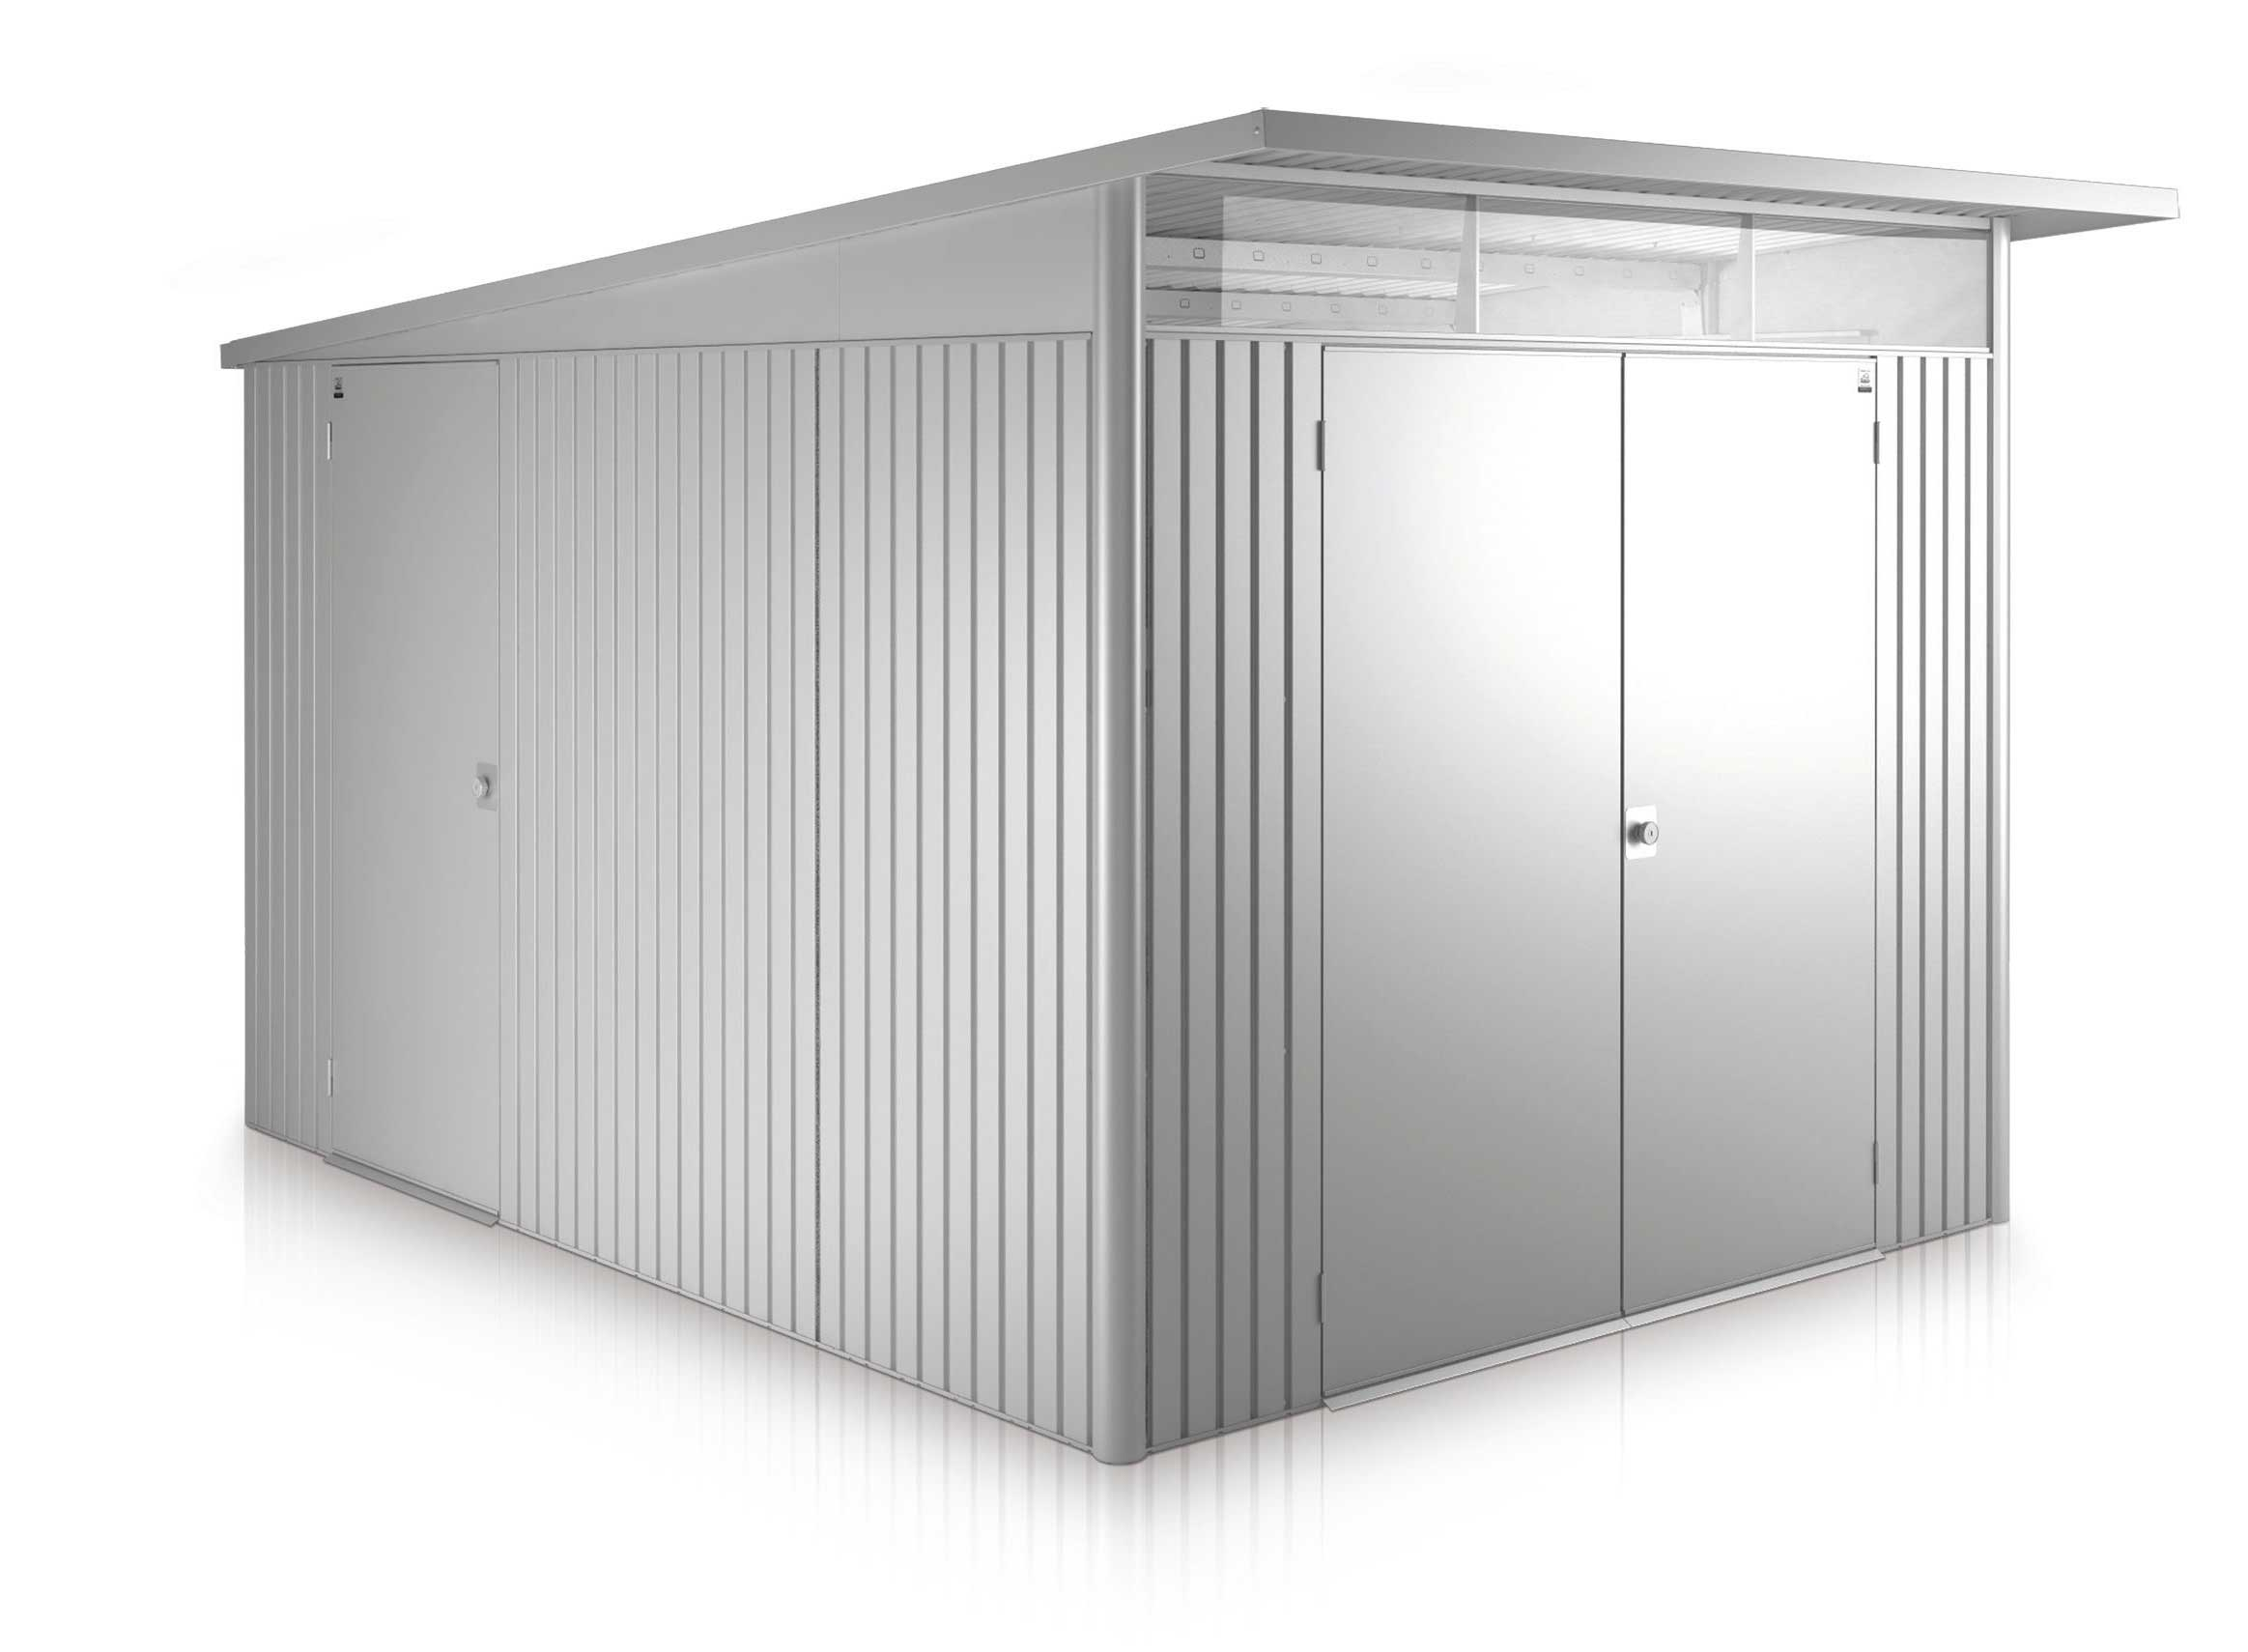 Gerätehaus Biohort AvantGarde Gr. XXL silber-metallic DT 260x380cm Bild 1